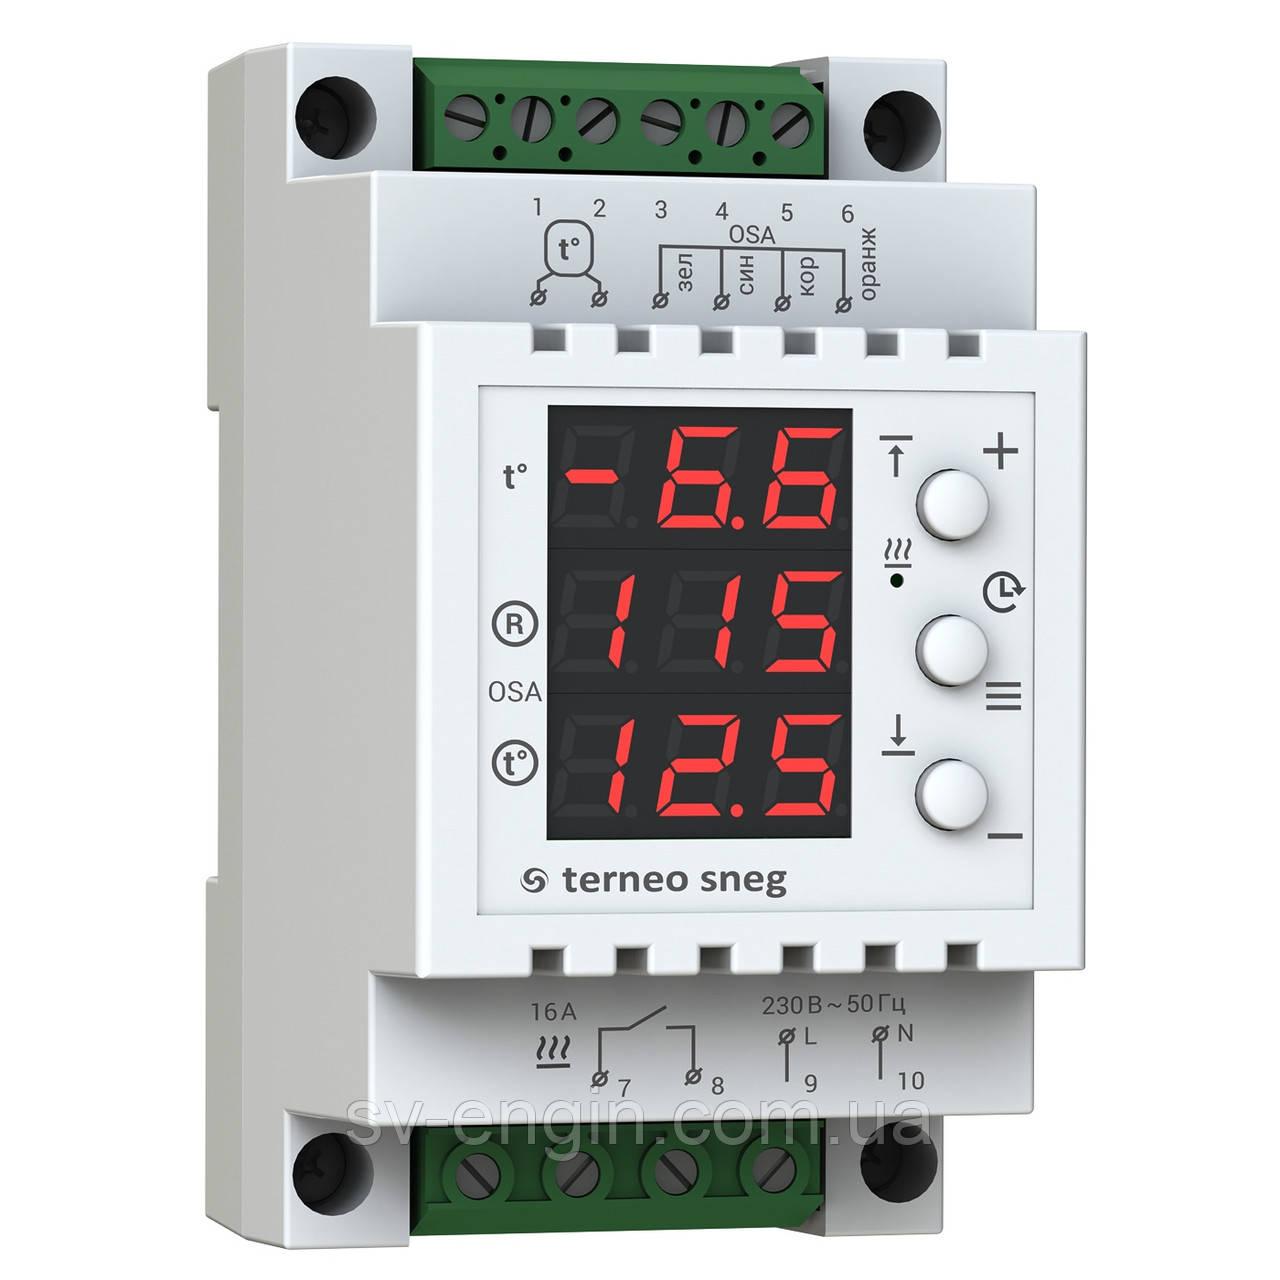 SNEG, SN20, SN30, KT, KT UNIC (DS ELECTRONICS, Украина) - терморегуляторы для систем снеготаяния